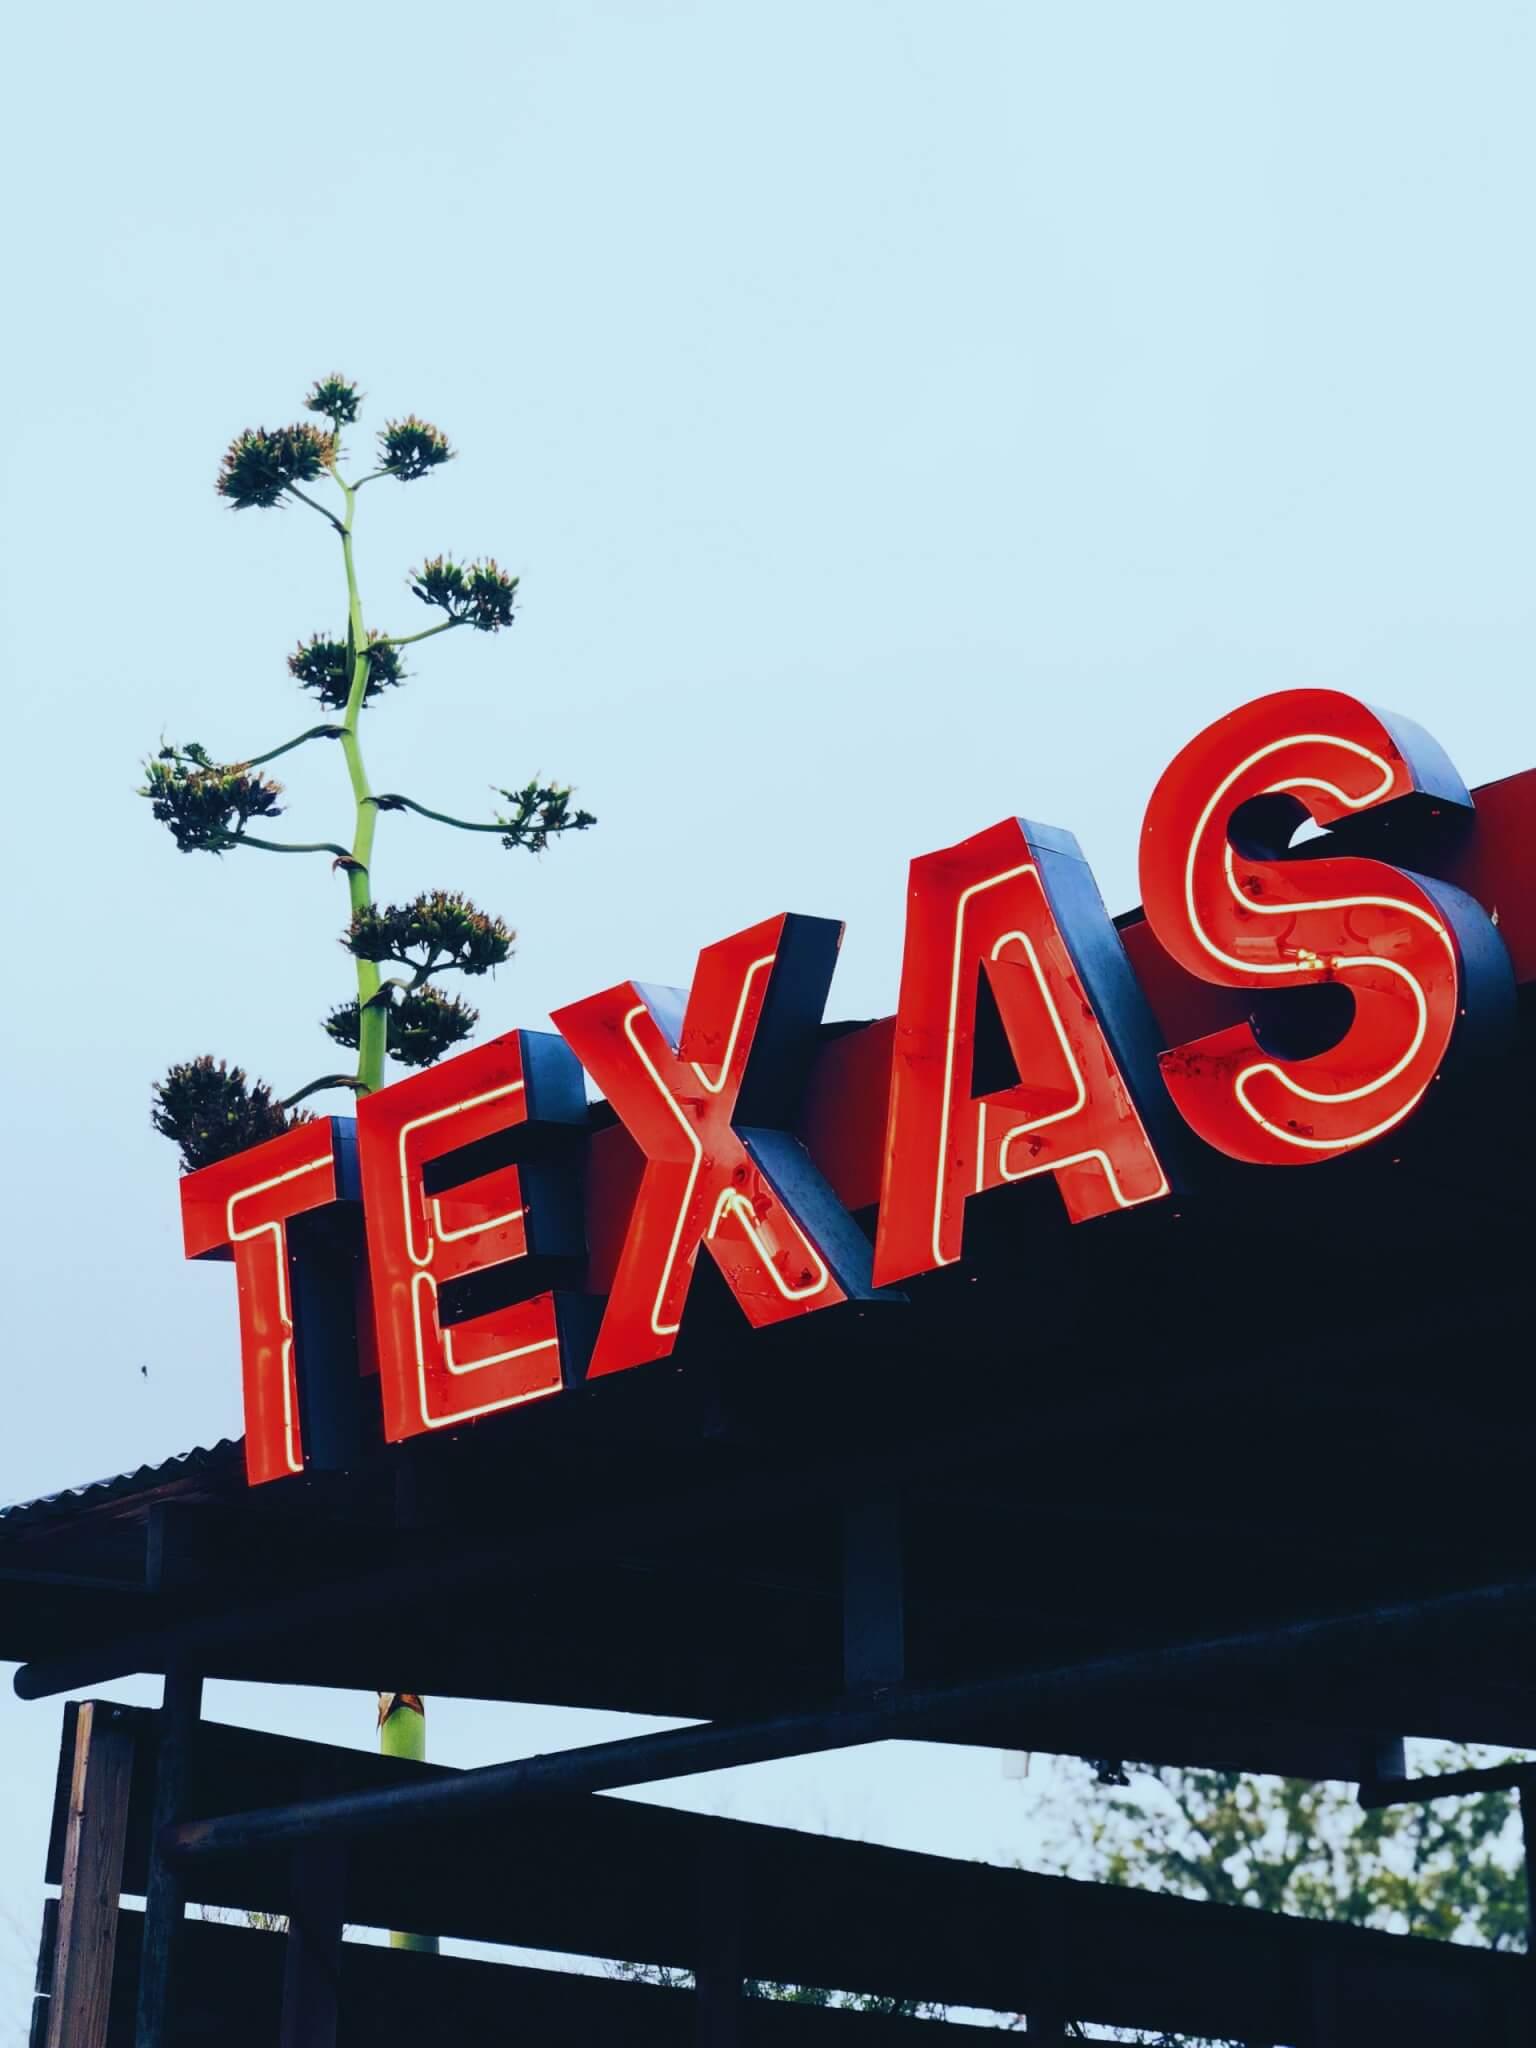 Texas Blackout Reveals Deep Impact of Environmental Racism, Aid Organizers Say